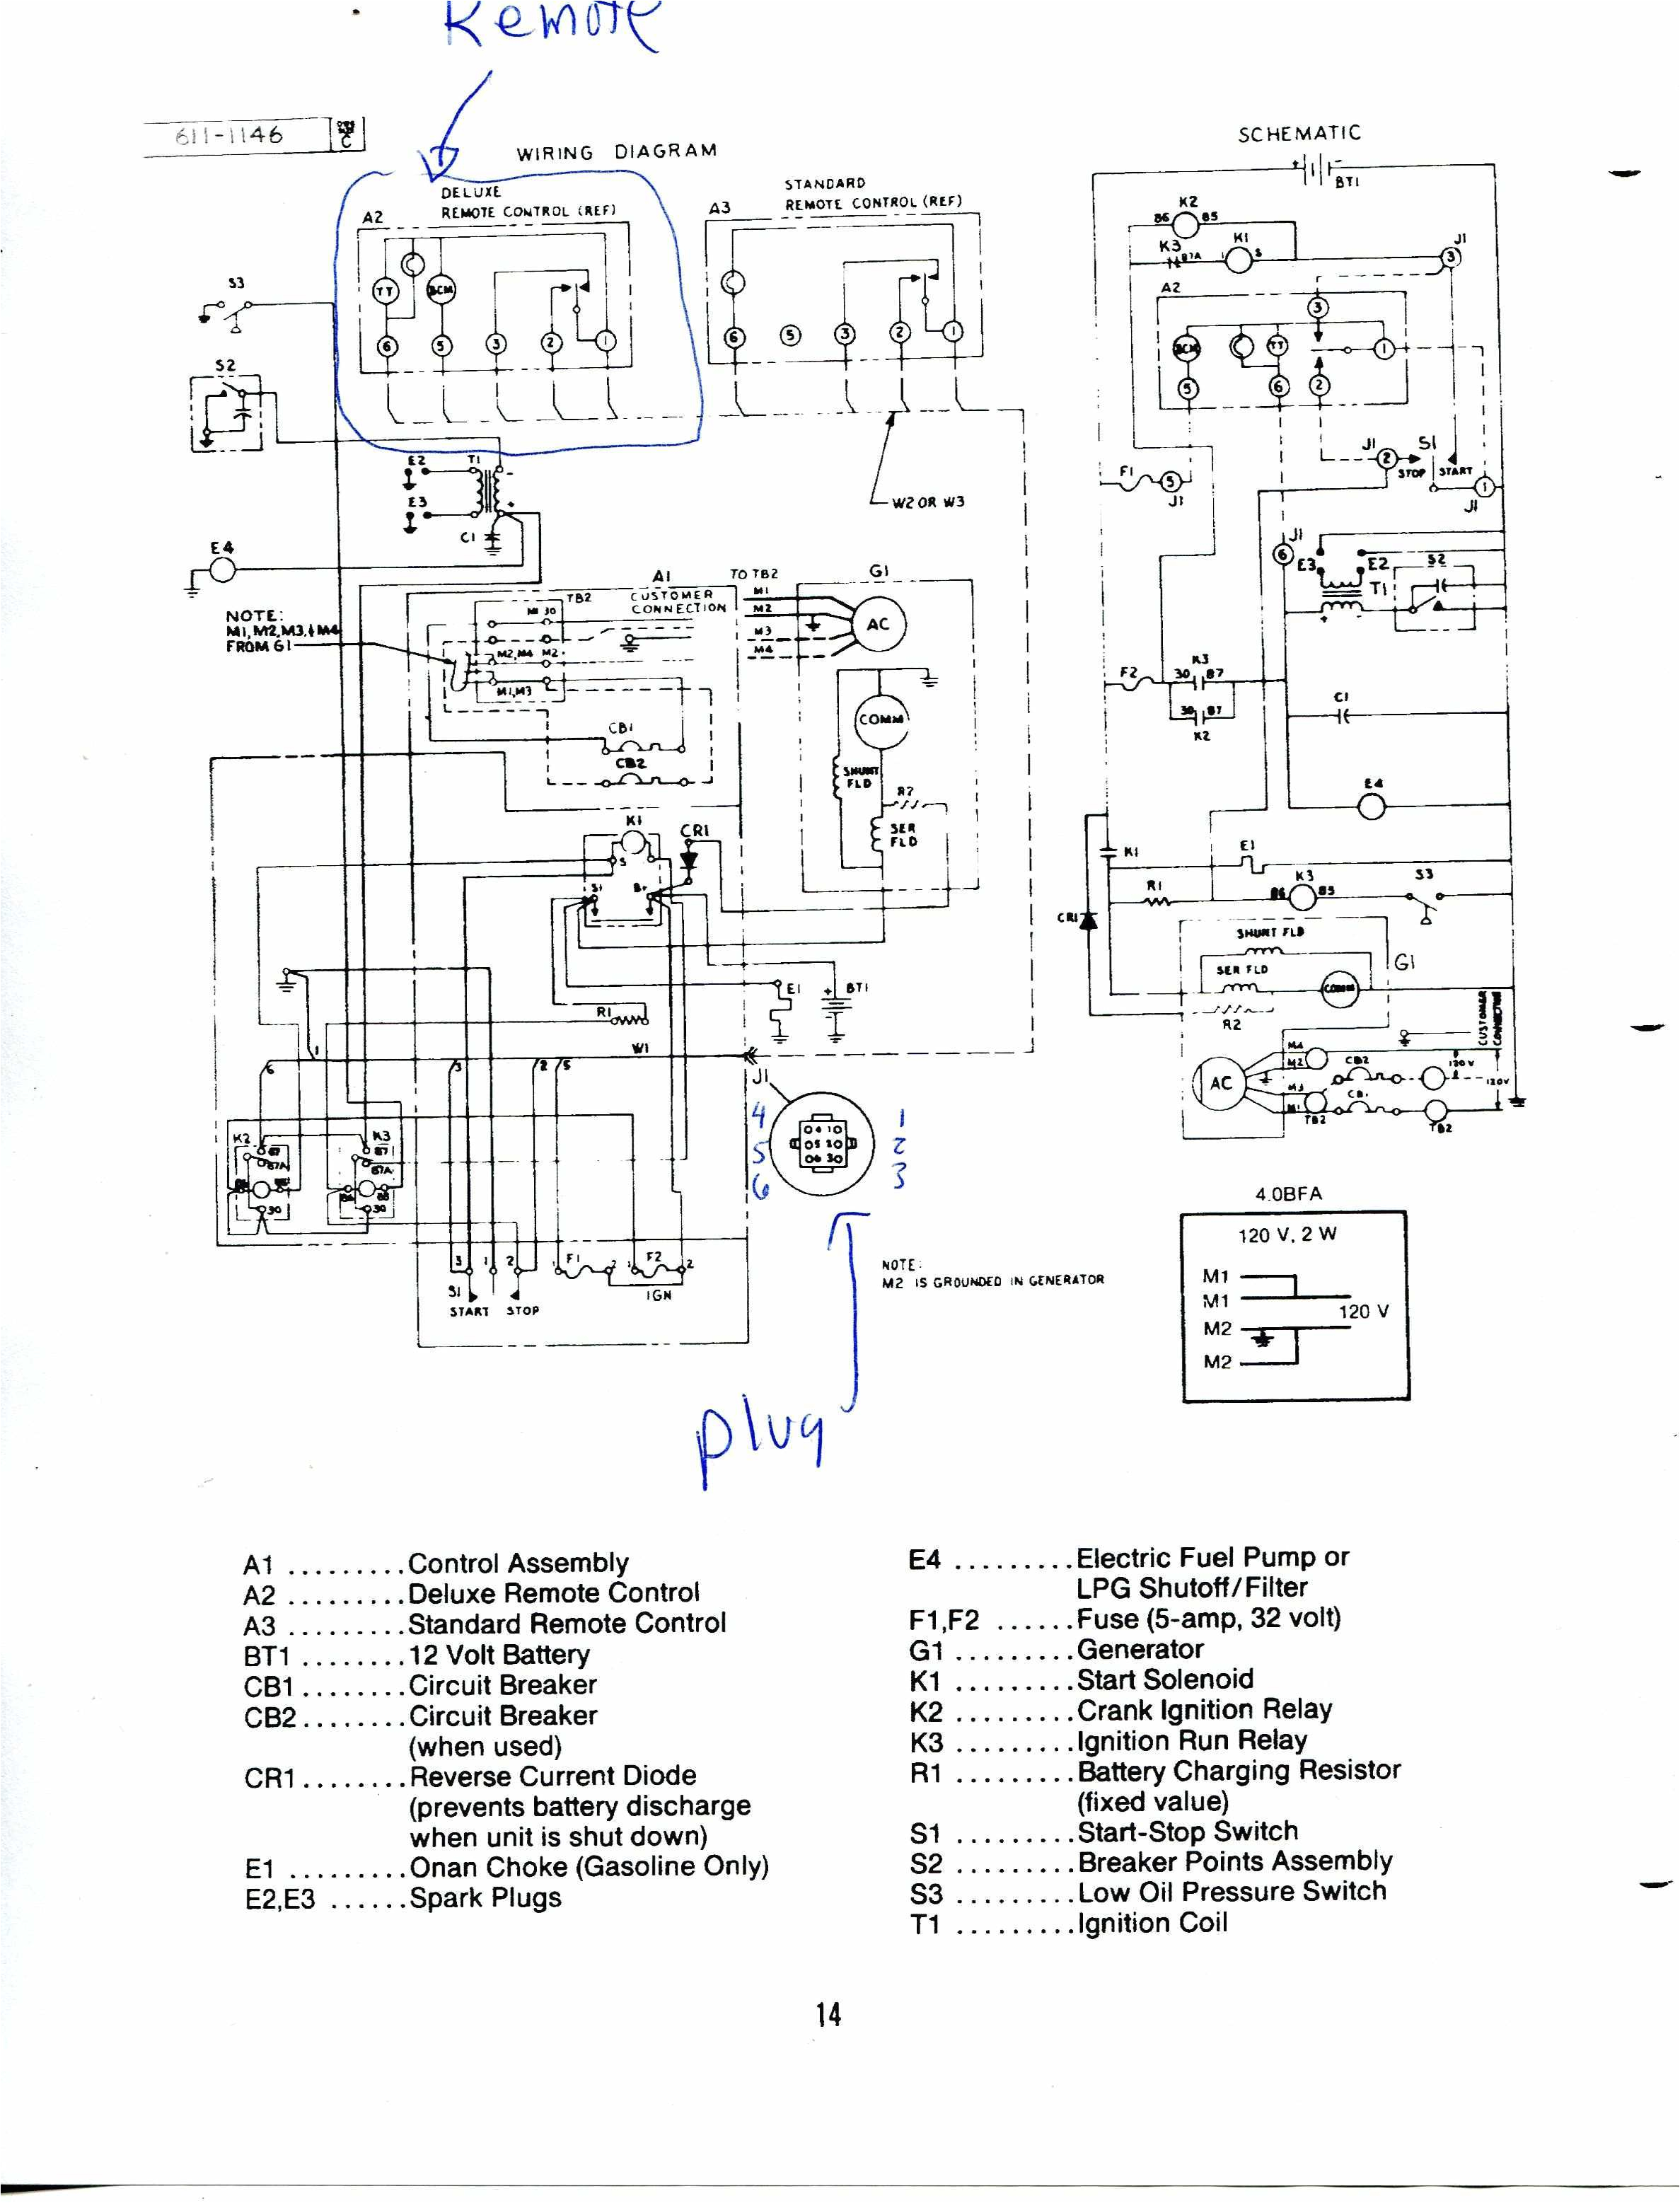 generac generator installation wiring diagram wiring diagram database generac wiring diagram model 4969 source generac manual transfer switch